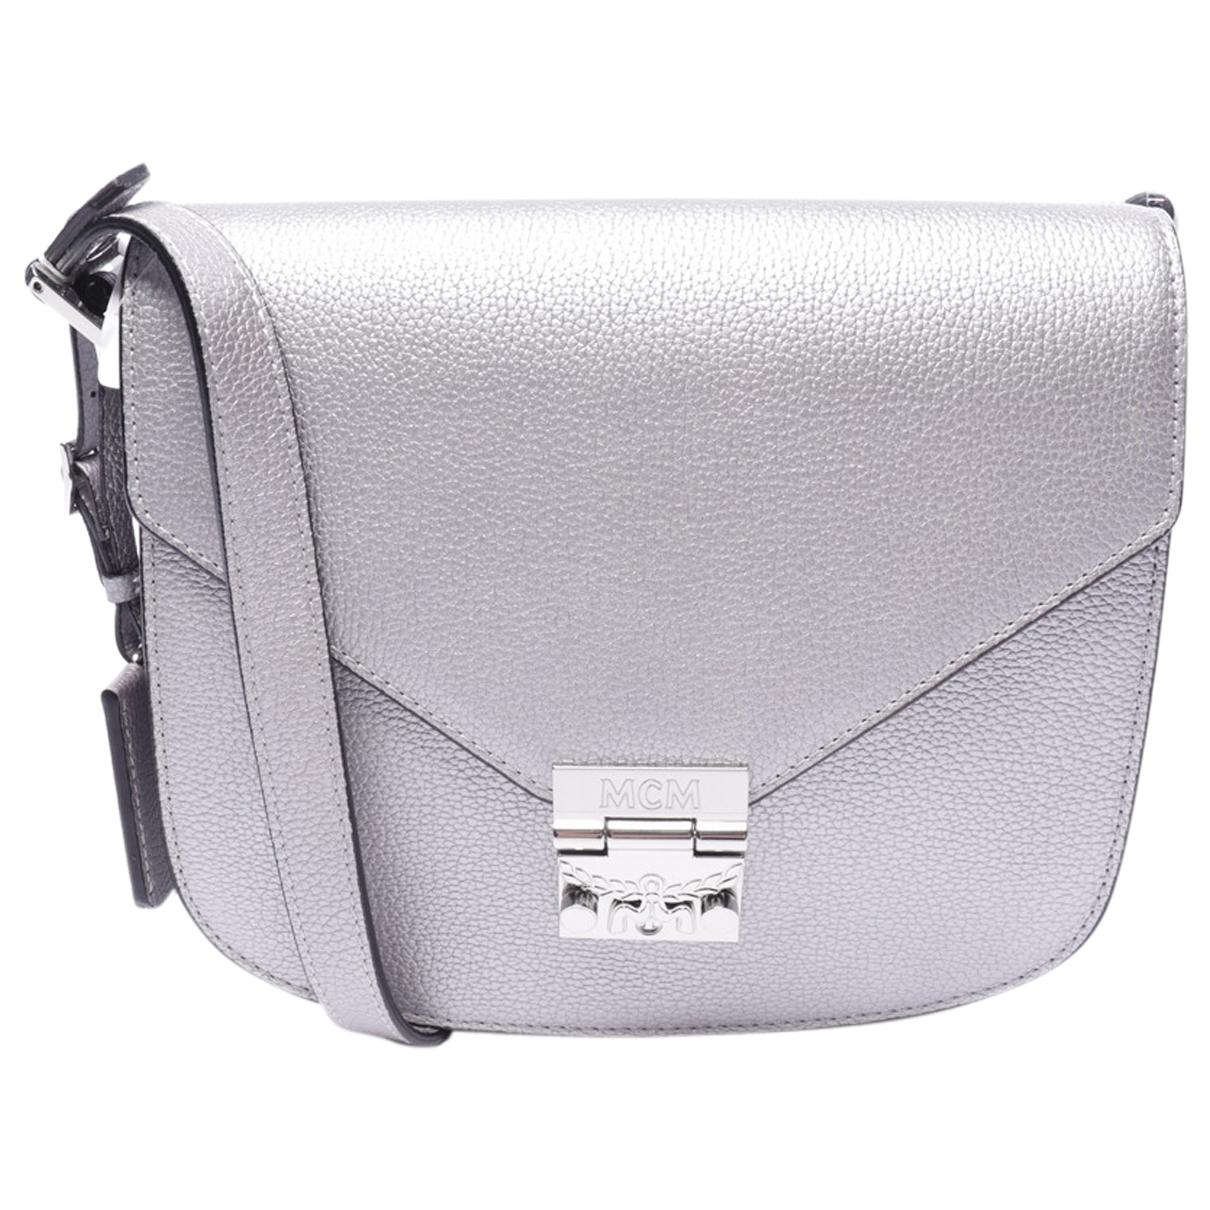 Mcm N Silver Leather handbag for Women N